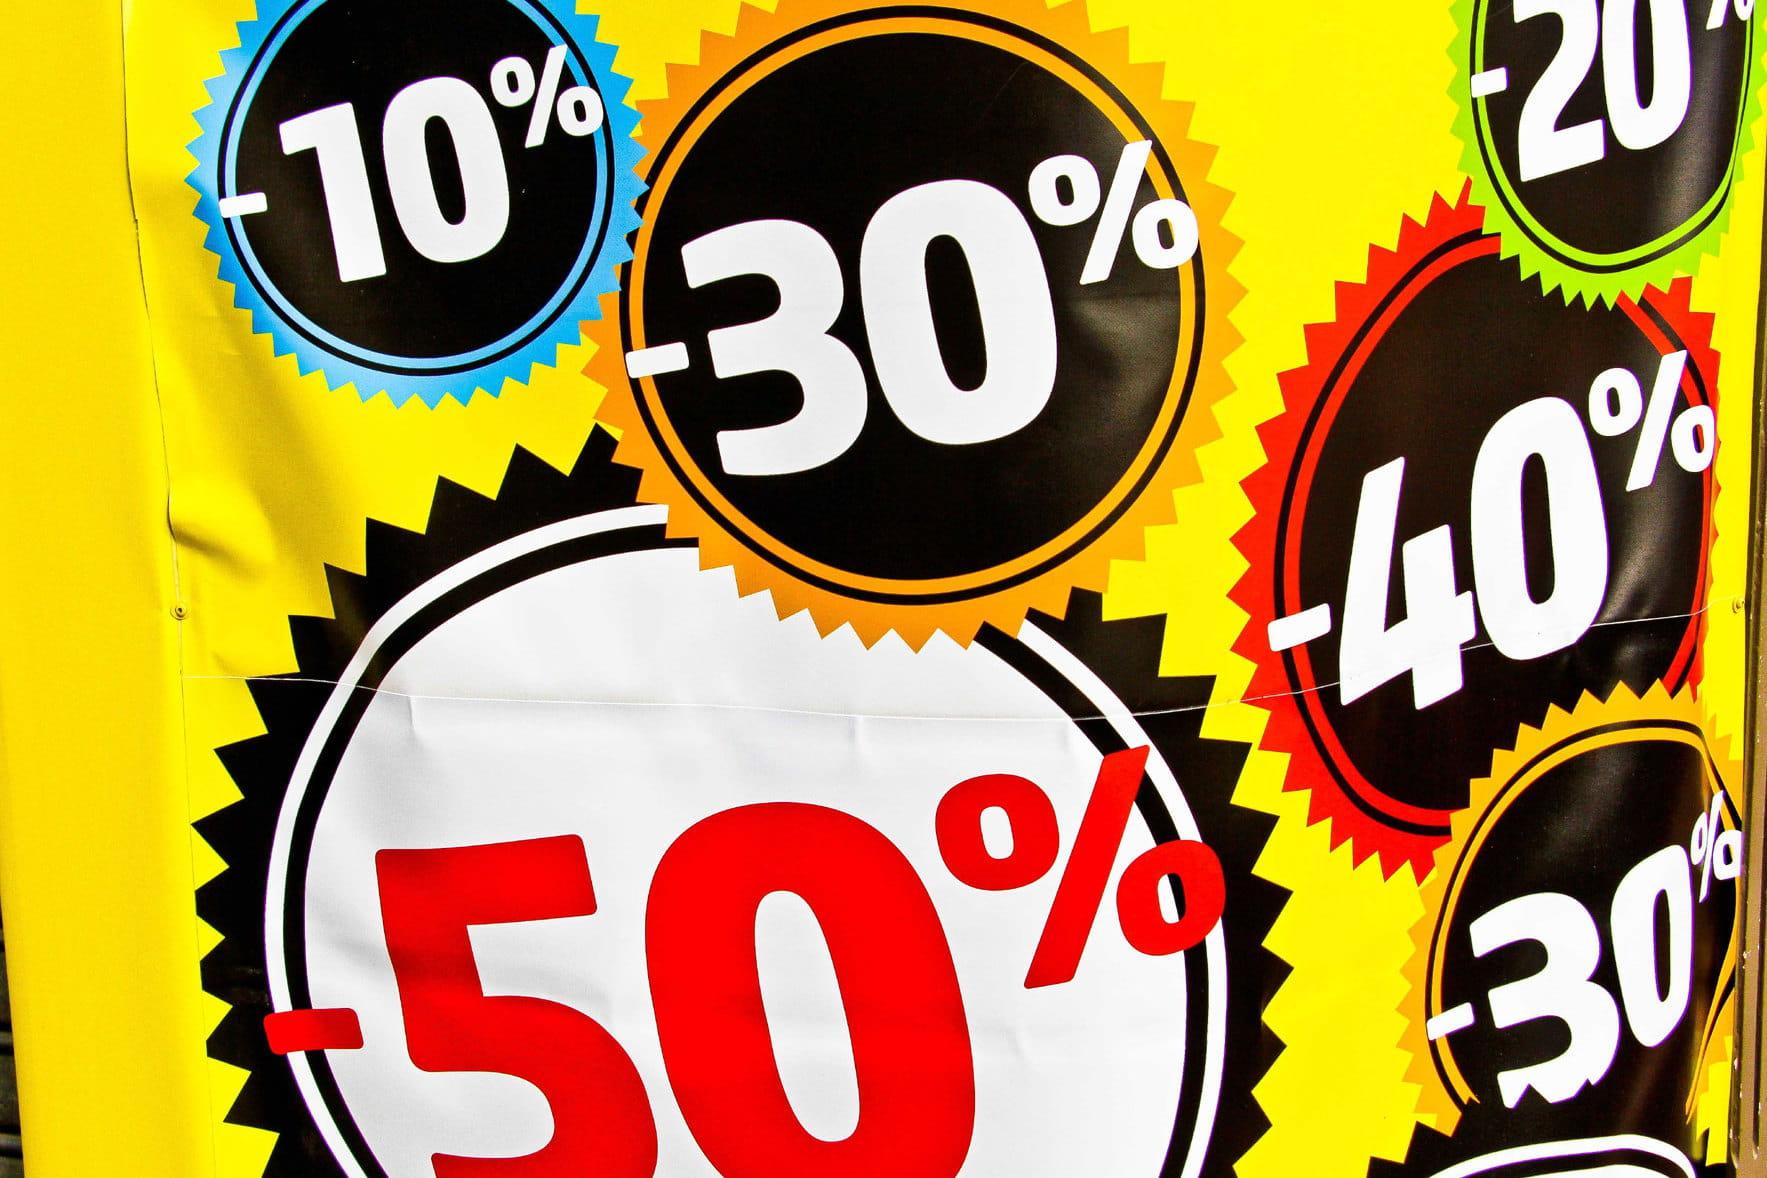 Target Black Friday 2014 Date Announced - BlackFriday.fm